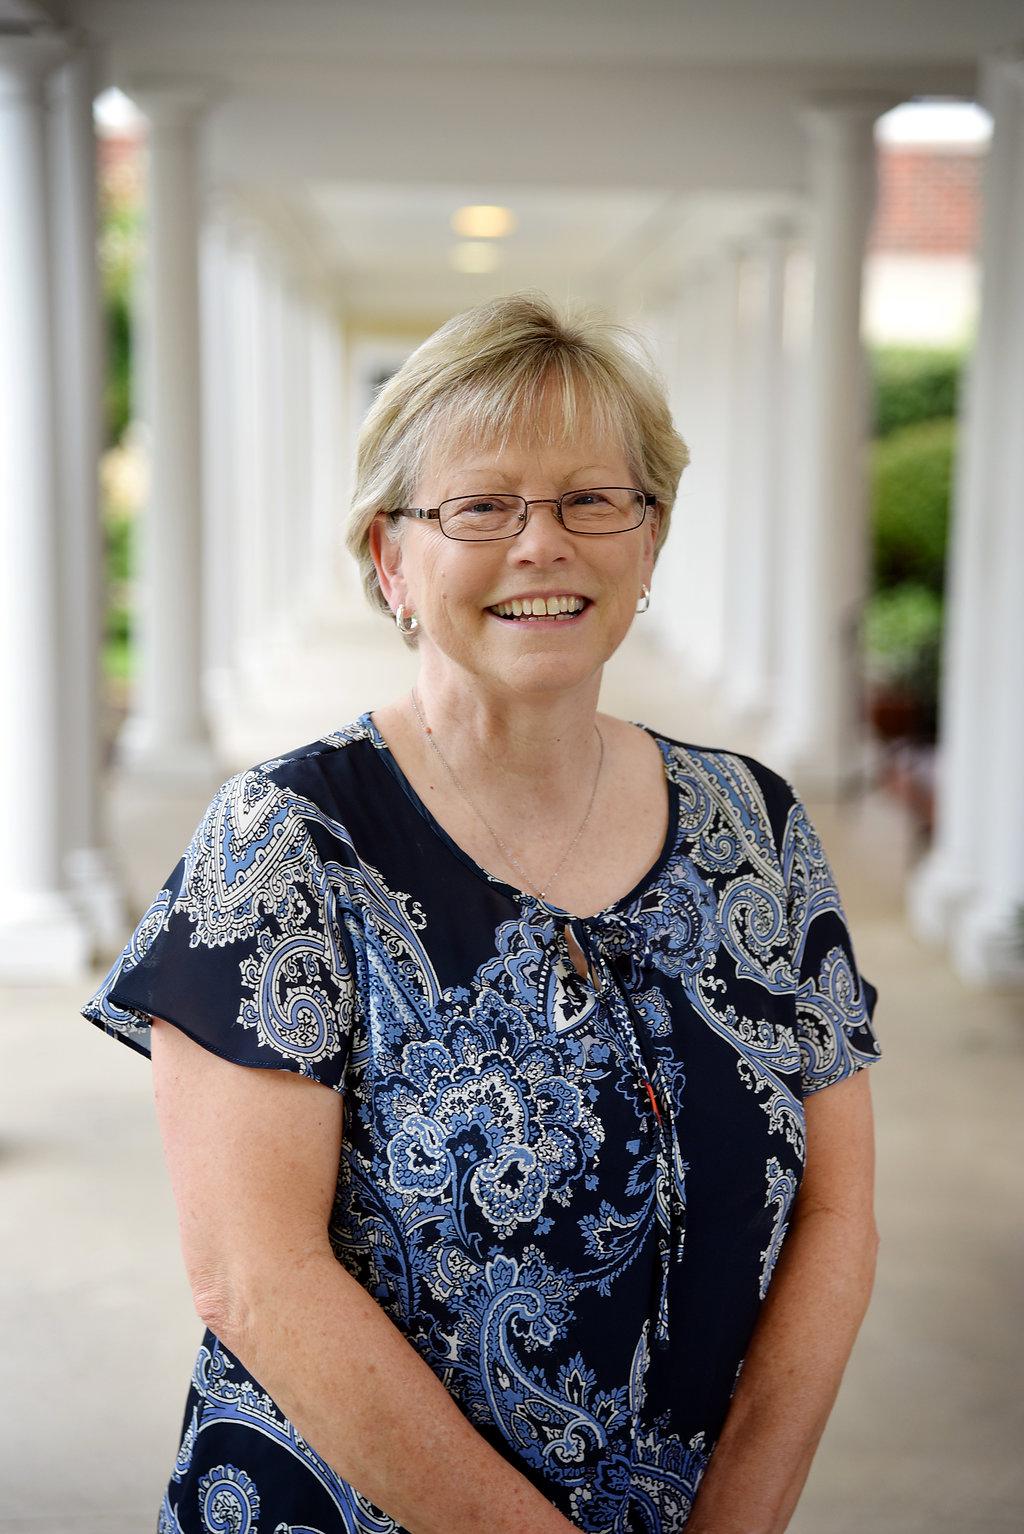 Susan Ledbetter